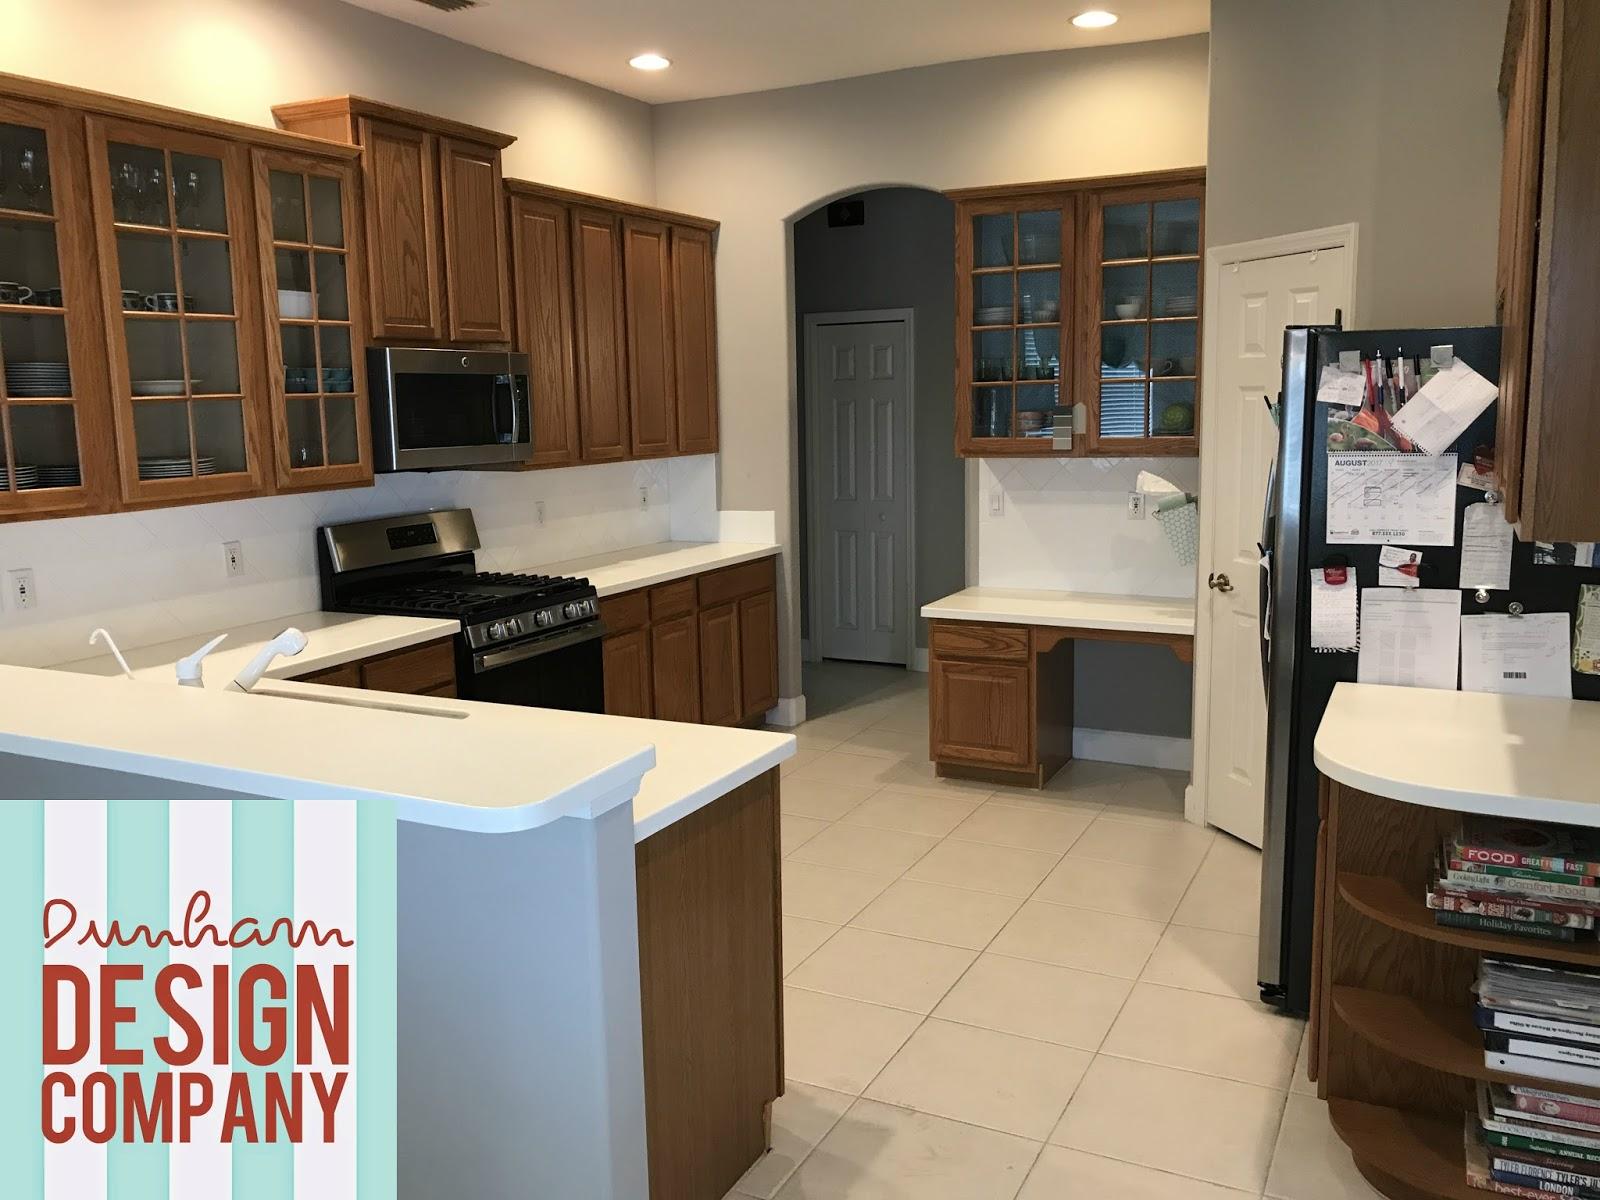 My Kitchen Remodel 2017 Dunham Design Company